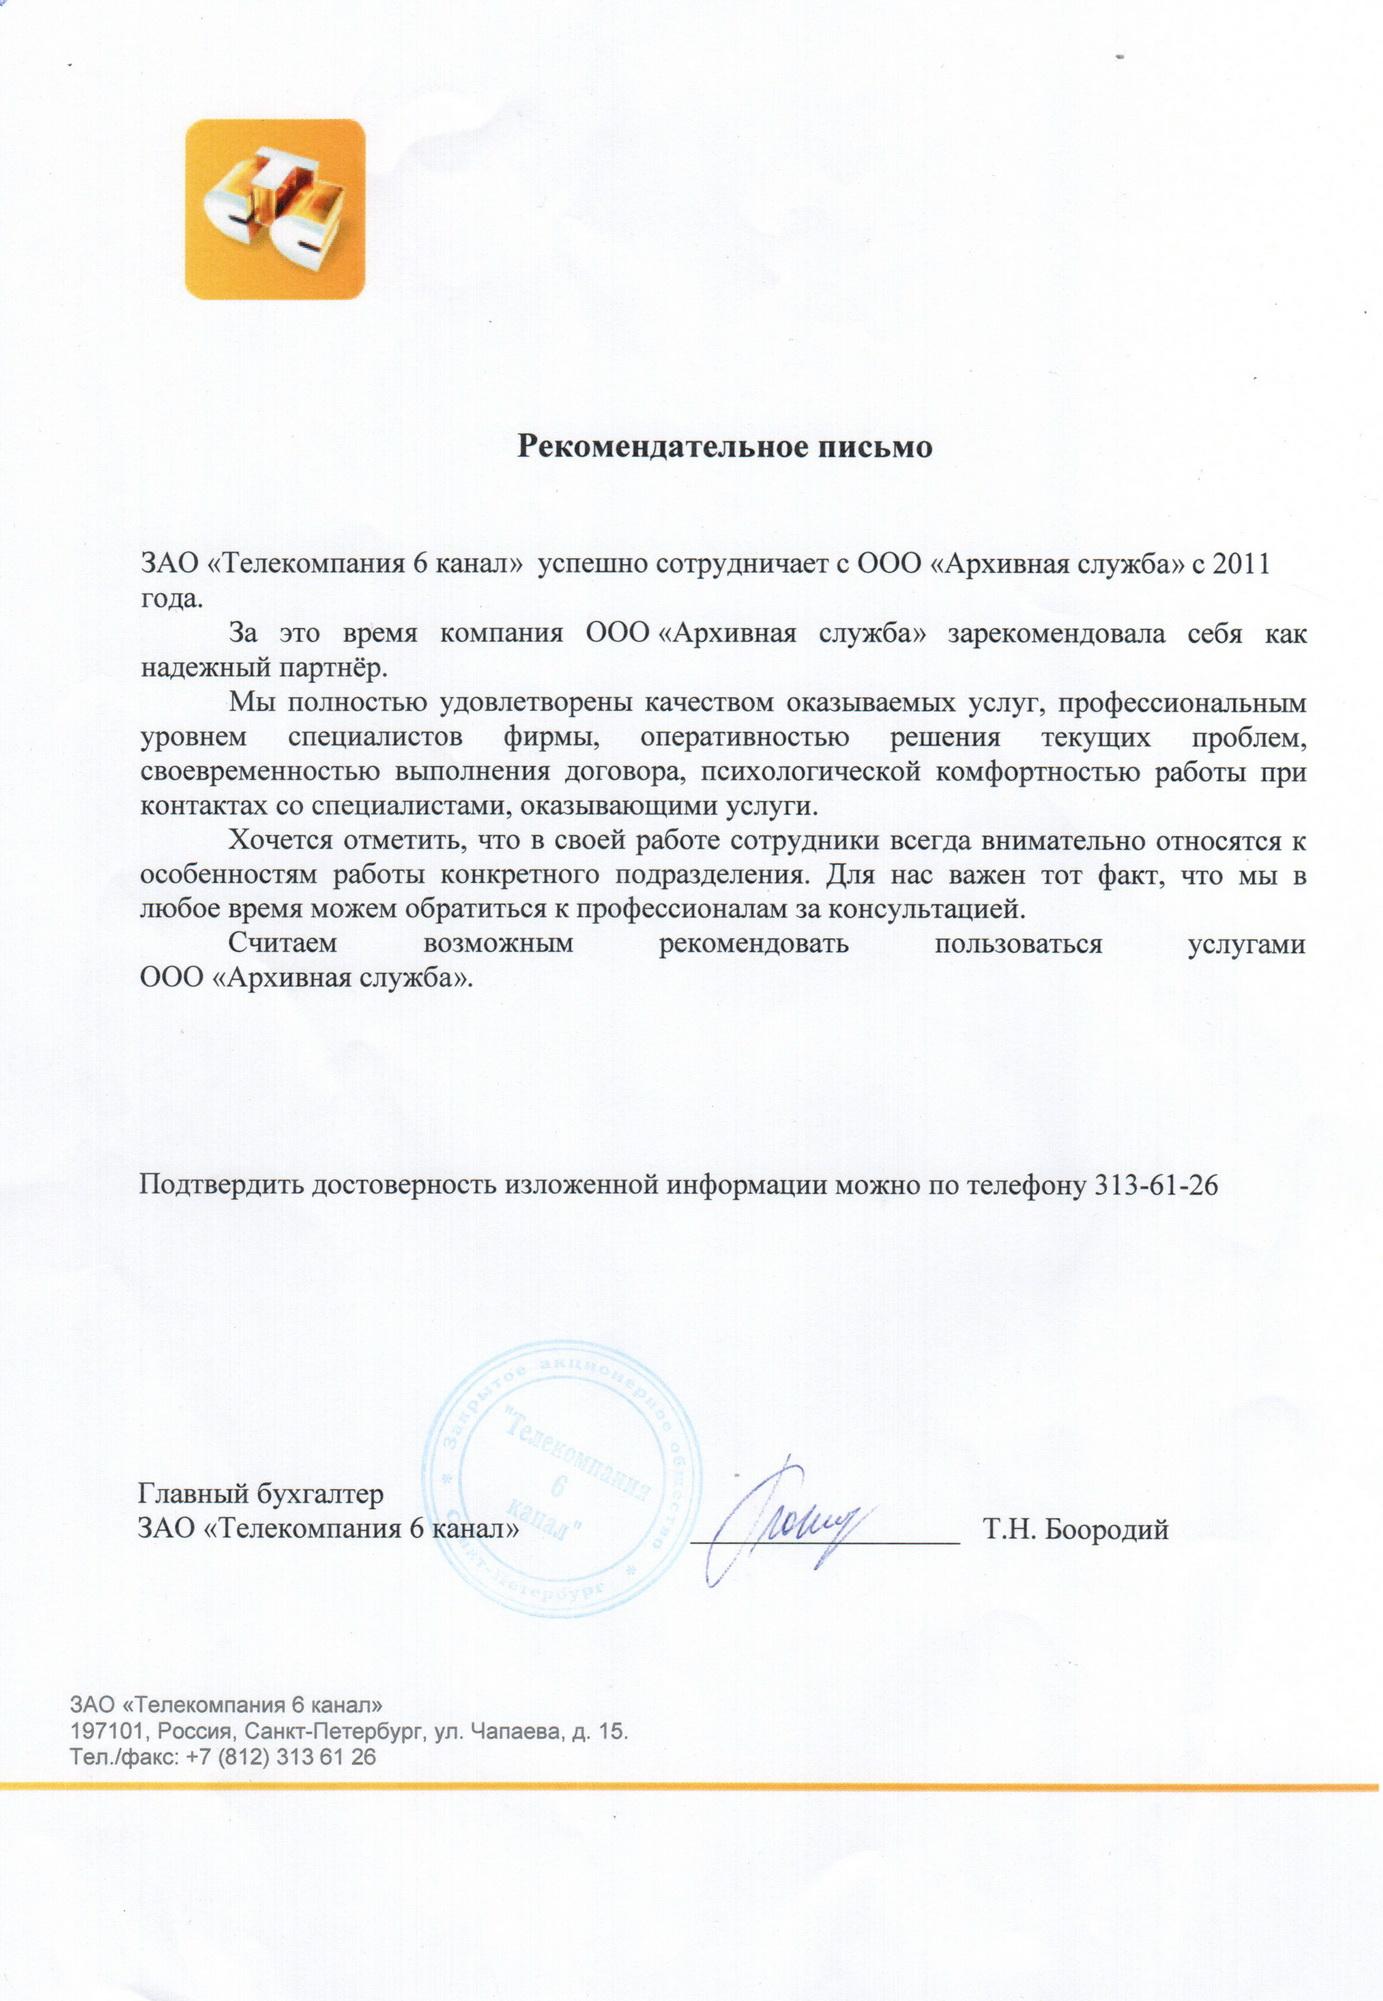 СТС - 6 канал